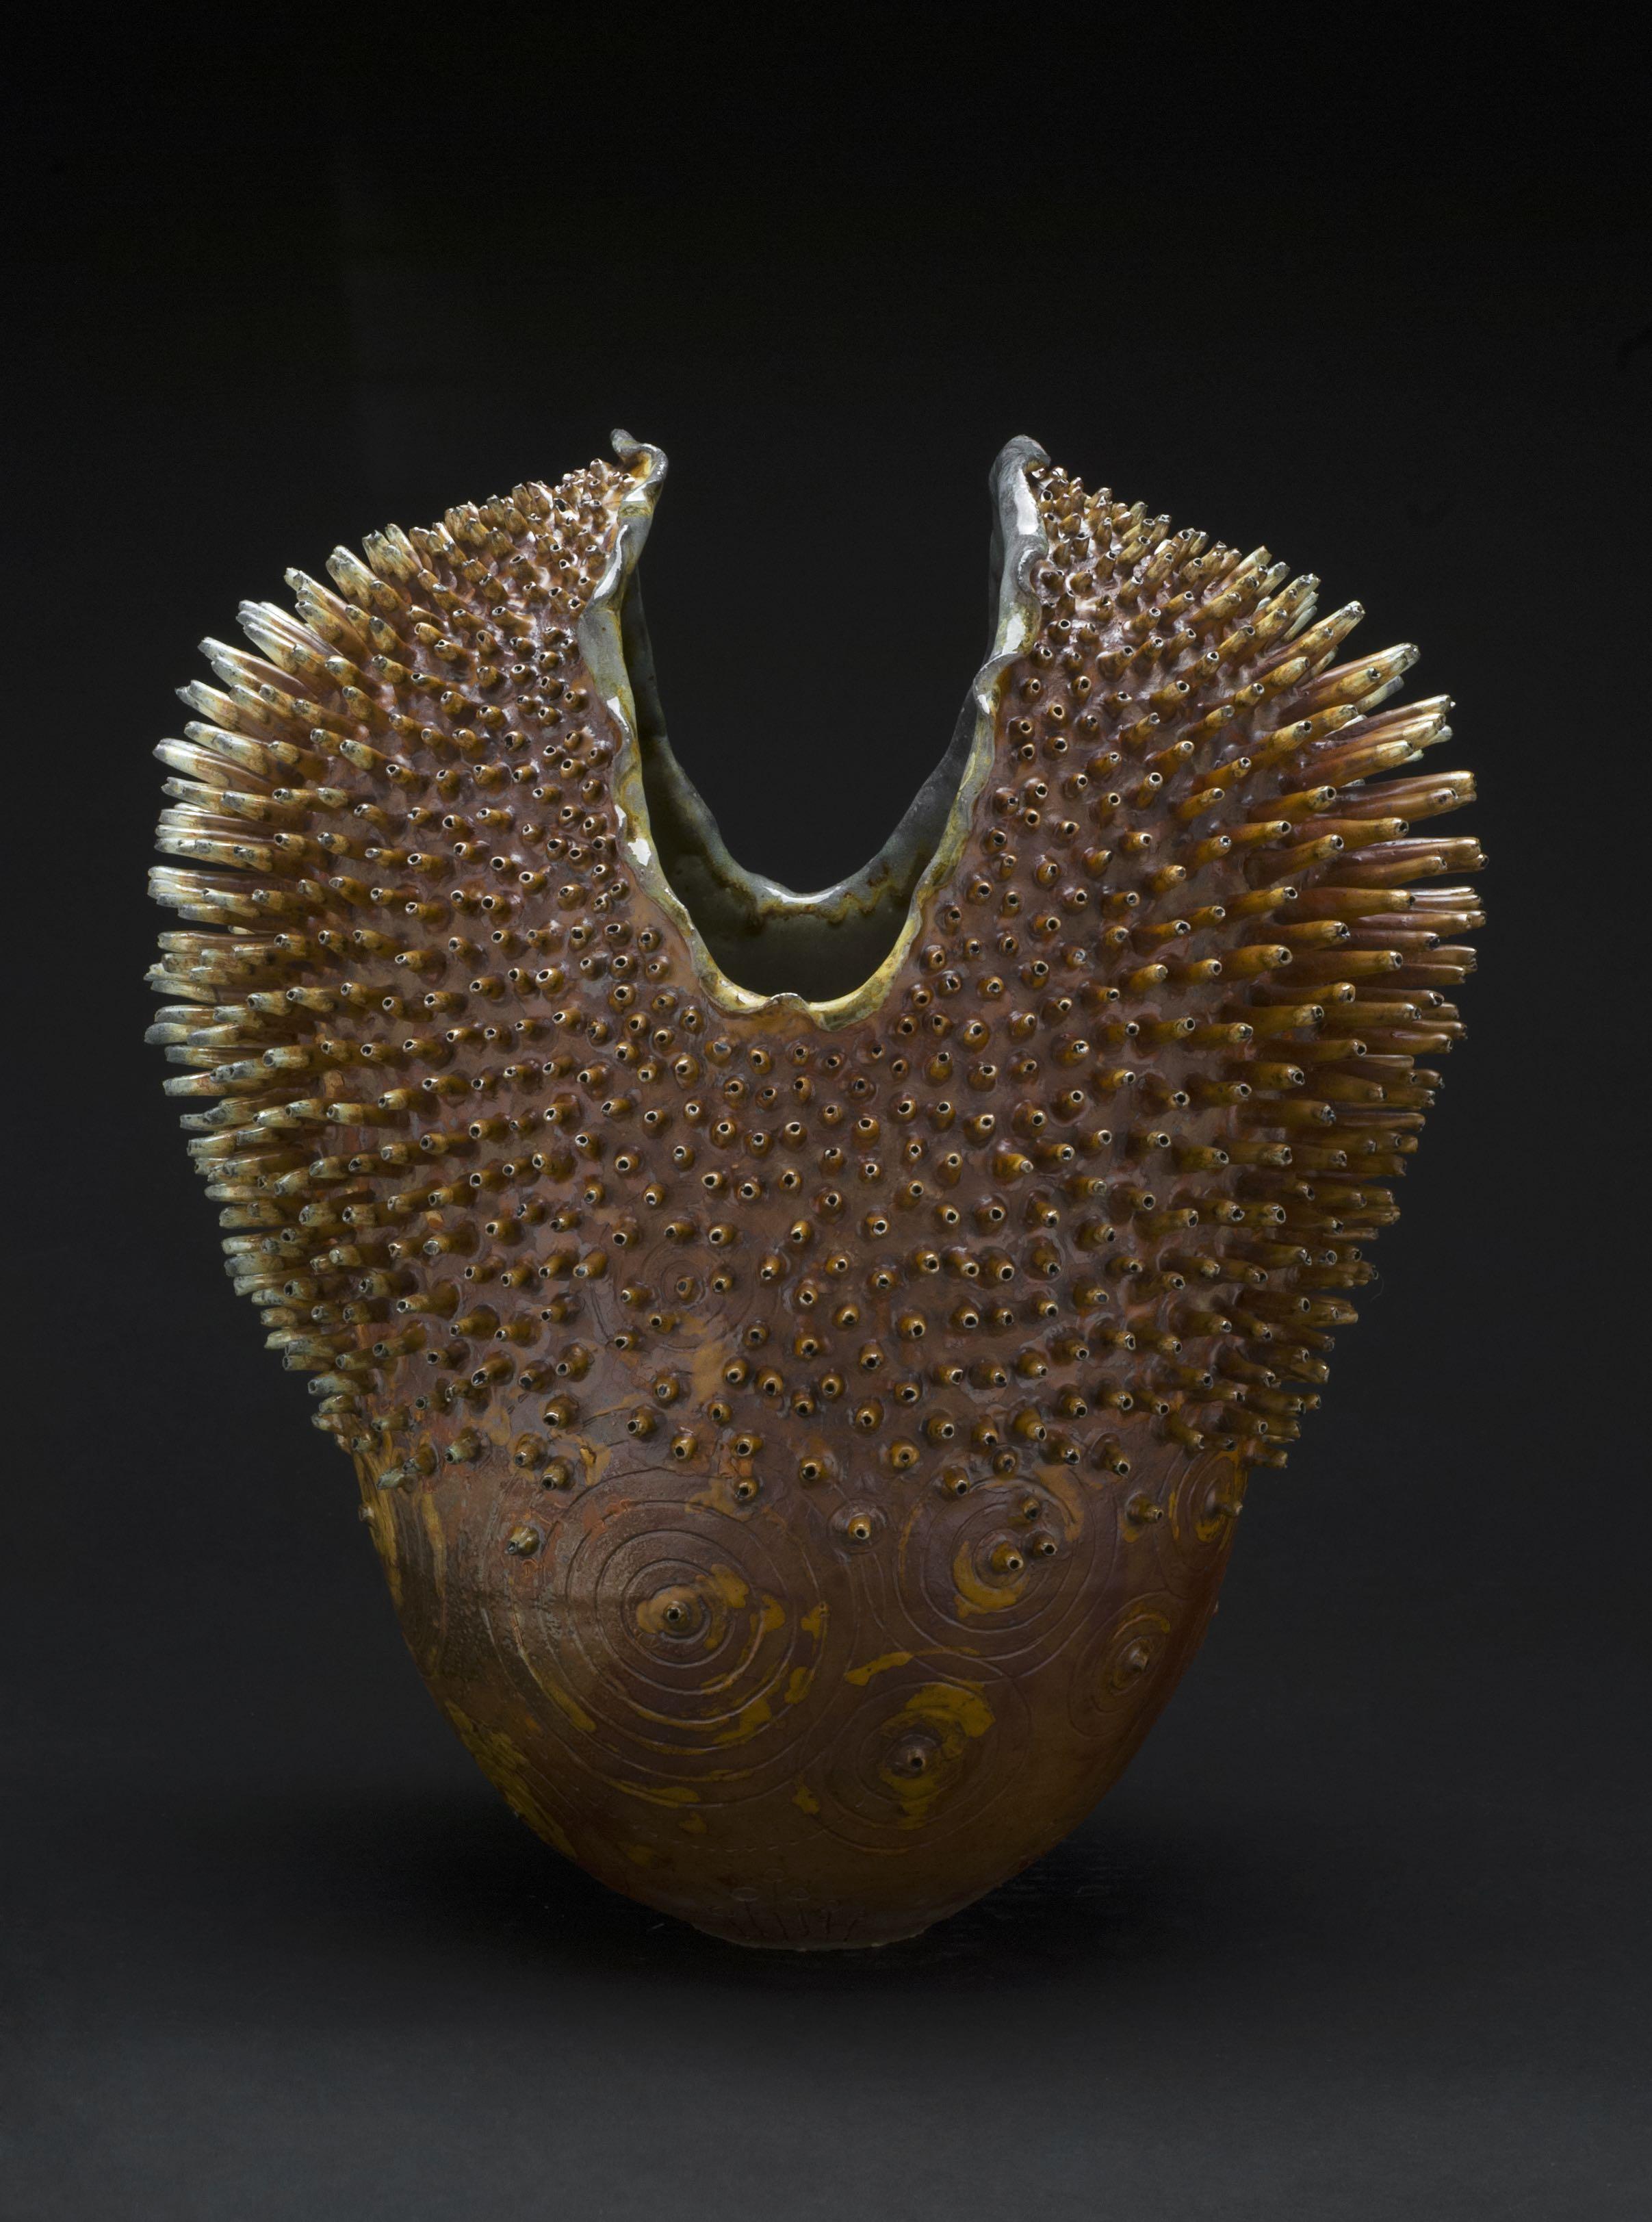 Melanie Ferguson  Urchin 8  , 2013 Handbuilt stoneware, sgraffito, oxide stains, Korean Celedon liner glaze, flashing slips 13.5 x 11 x 7 inches 34.3 x 27.9 x 17.8 cm MFe 7